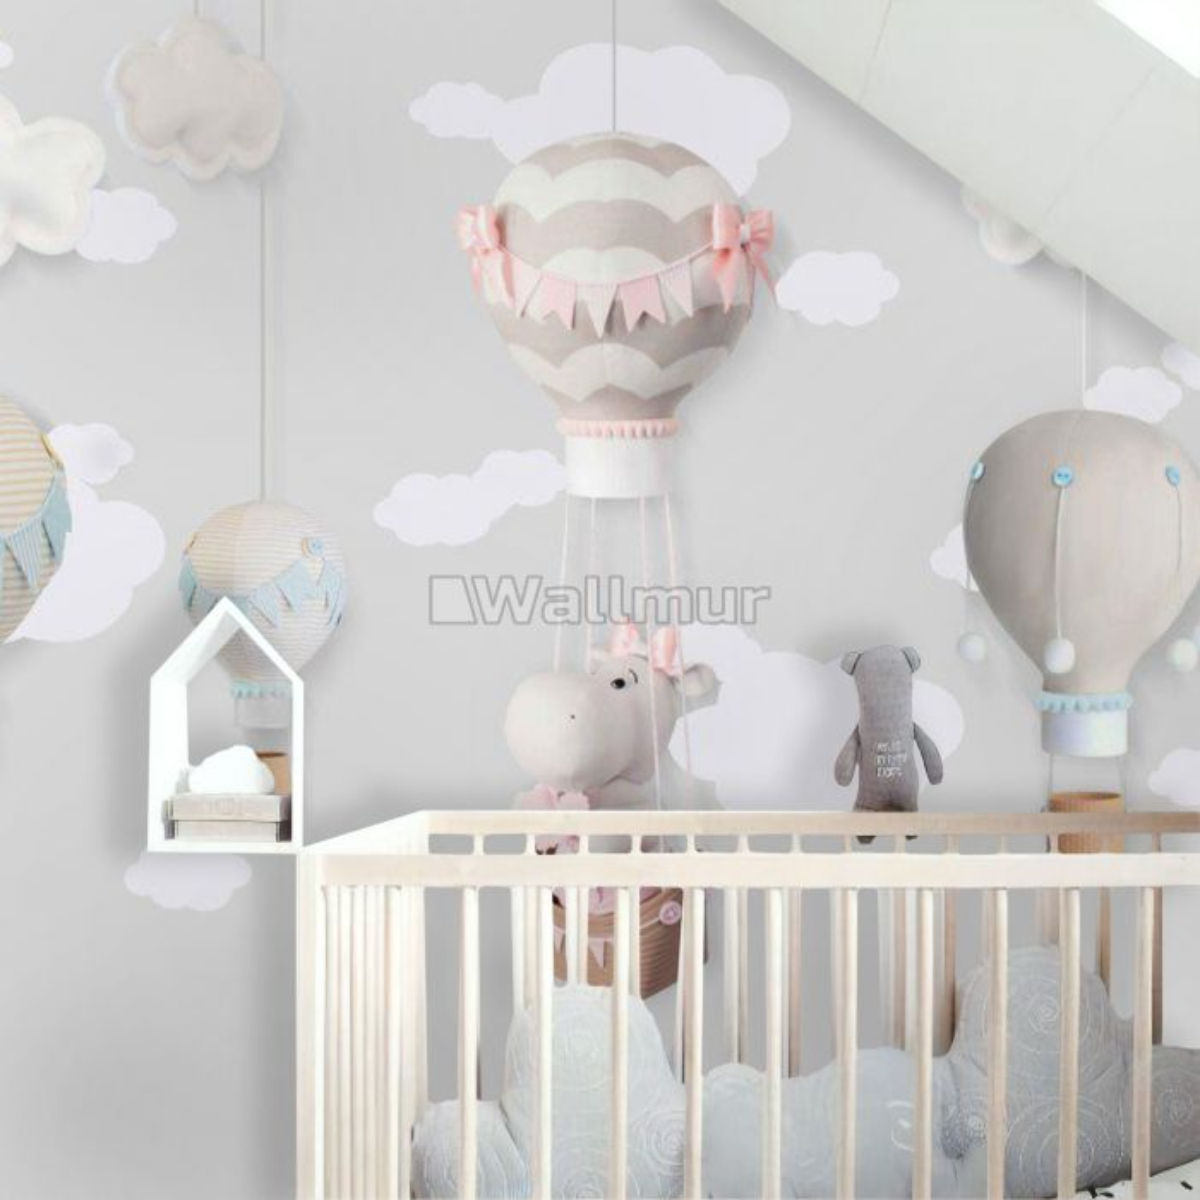 Little Hot Air Balloons with Clouds Wallpaper Mural